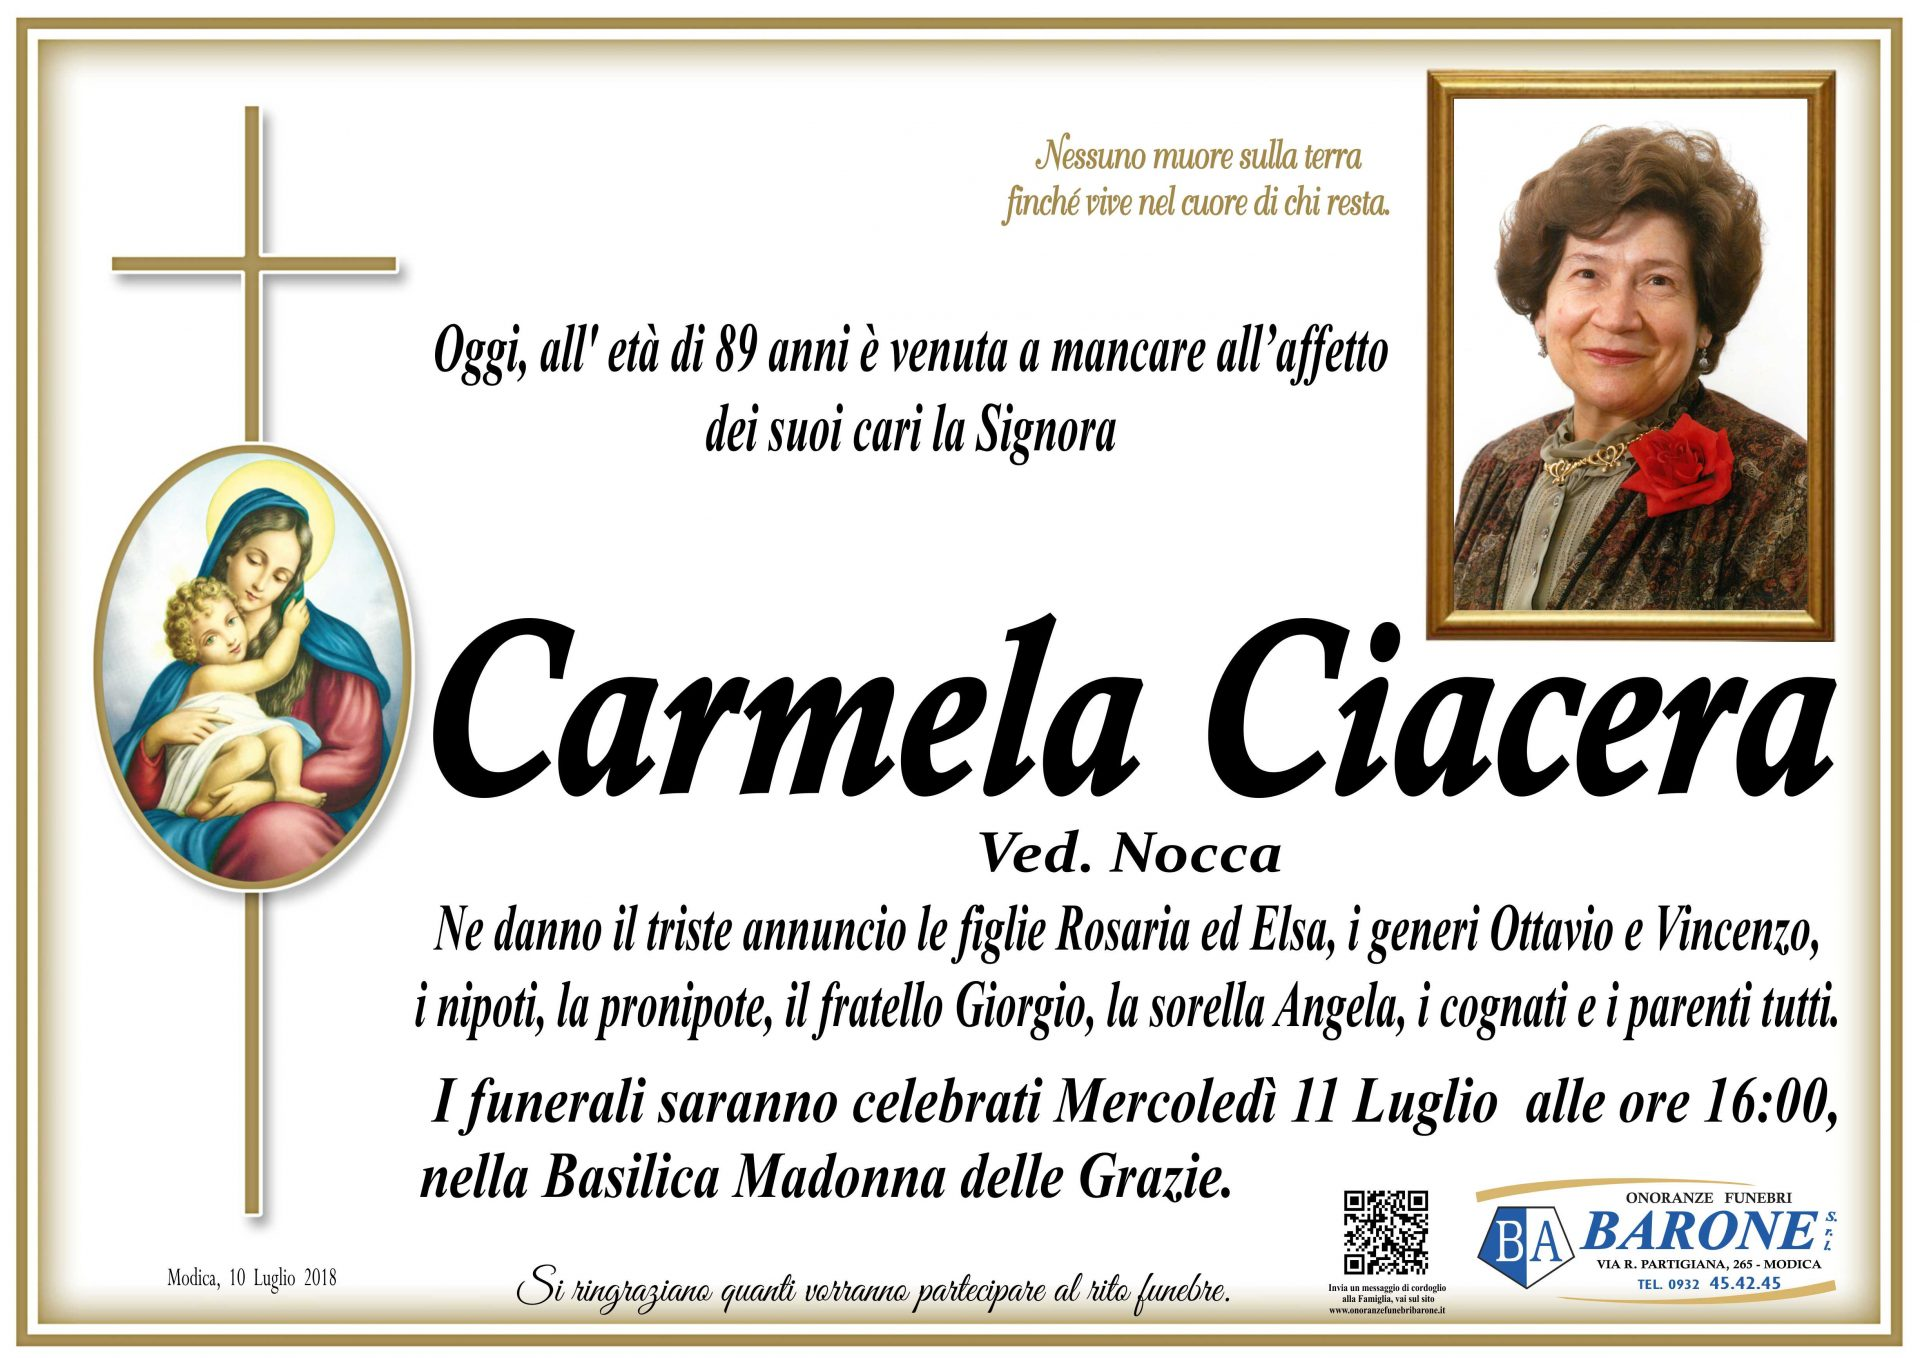 Carmela Ciacera